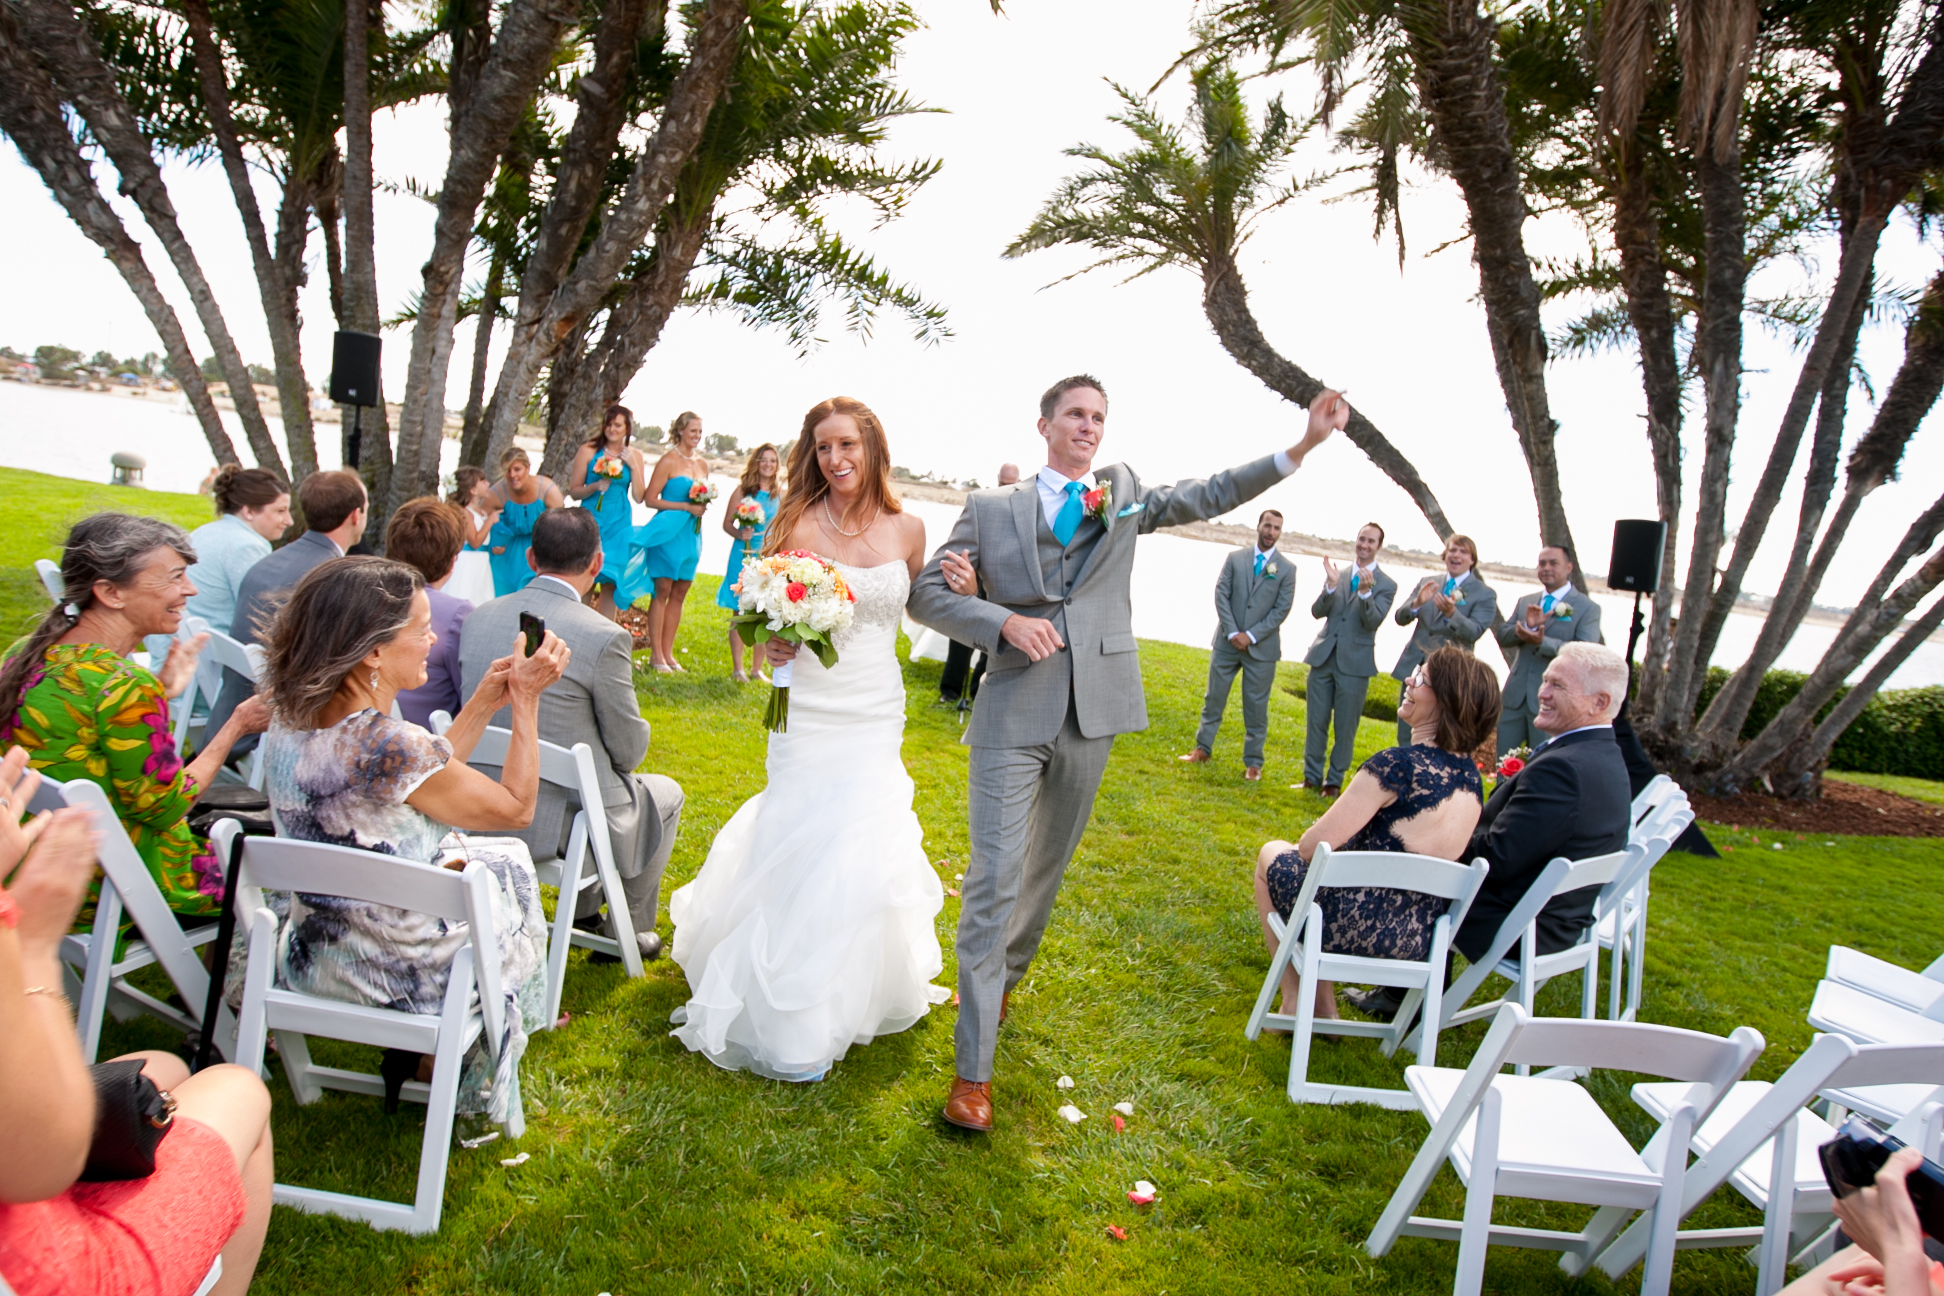 Knutson Wedding_0184.jpg